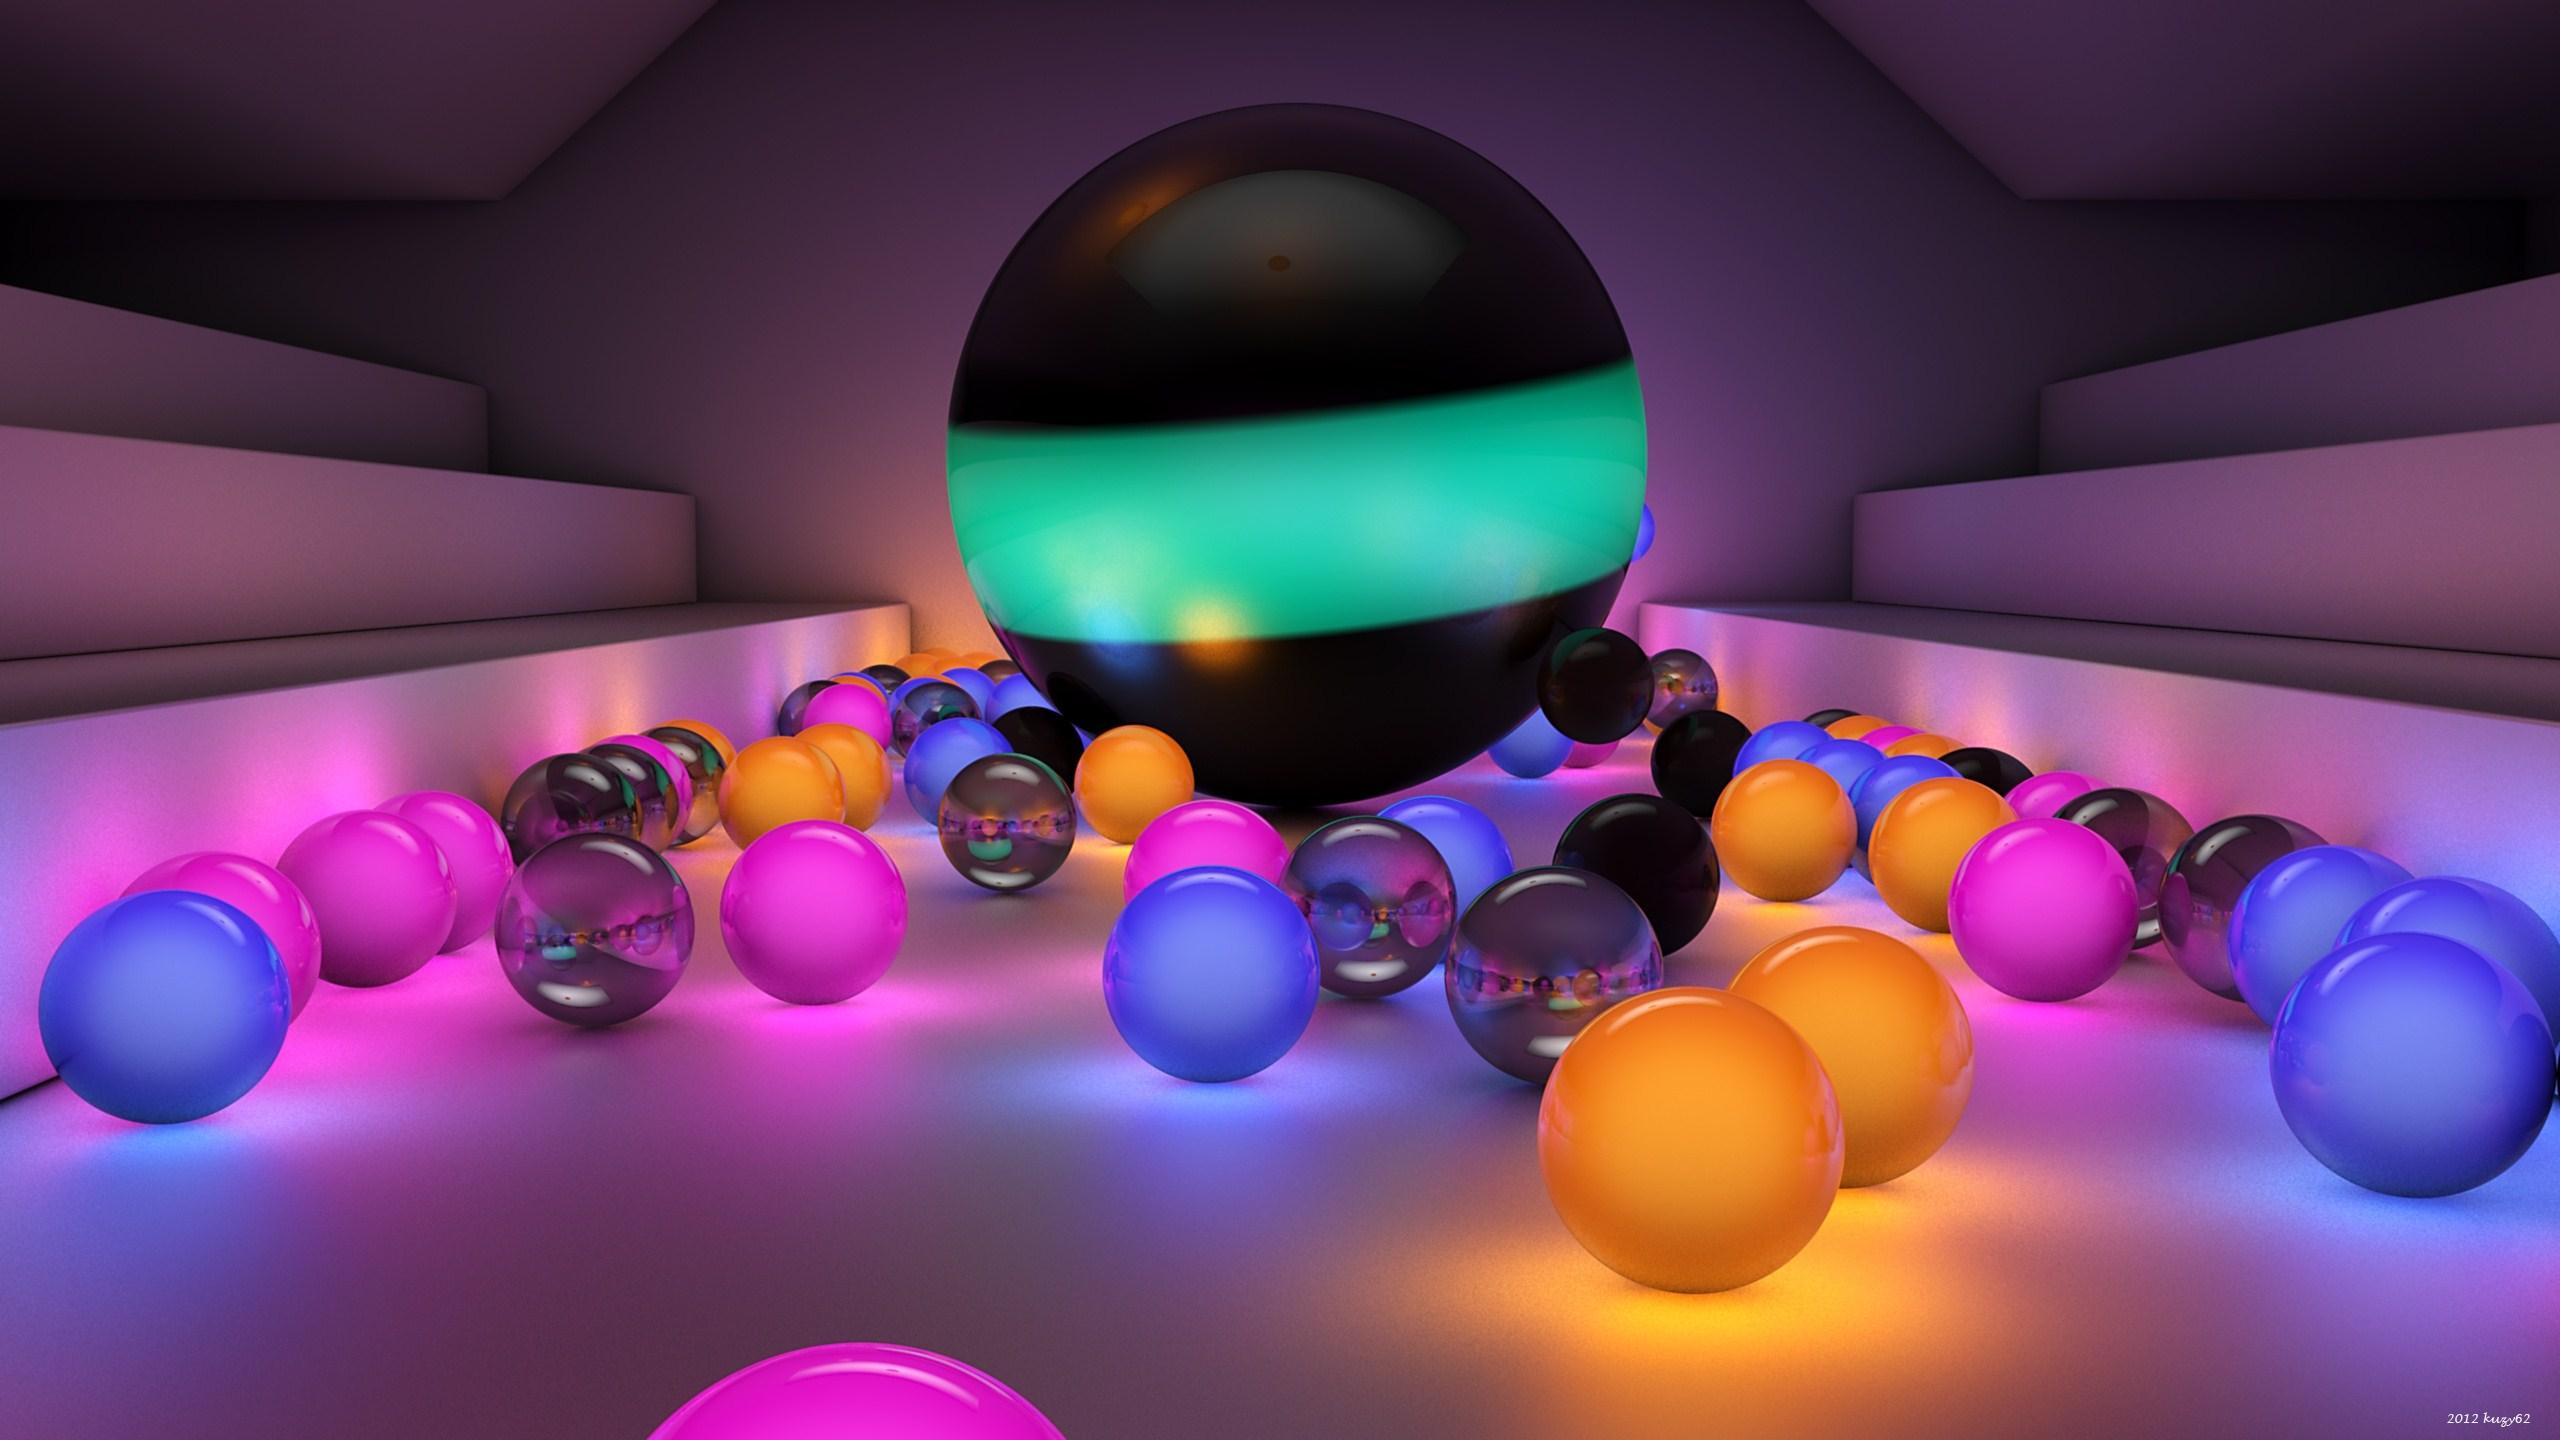 Oppo 3d Wallpaper Balls Size Background 2560 X 1440